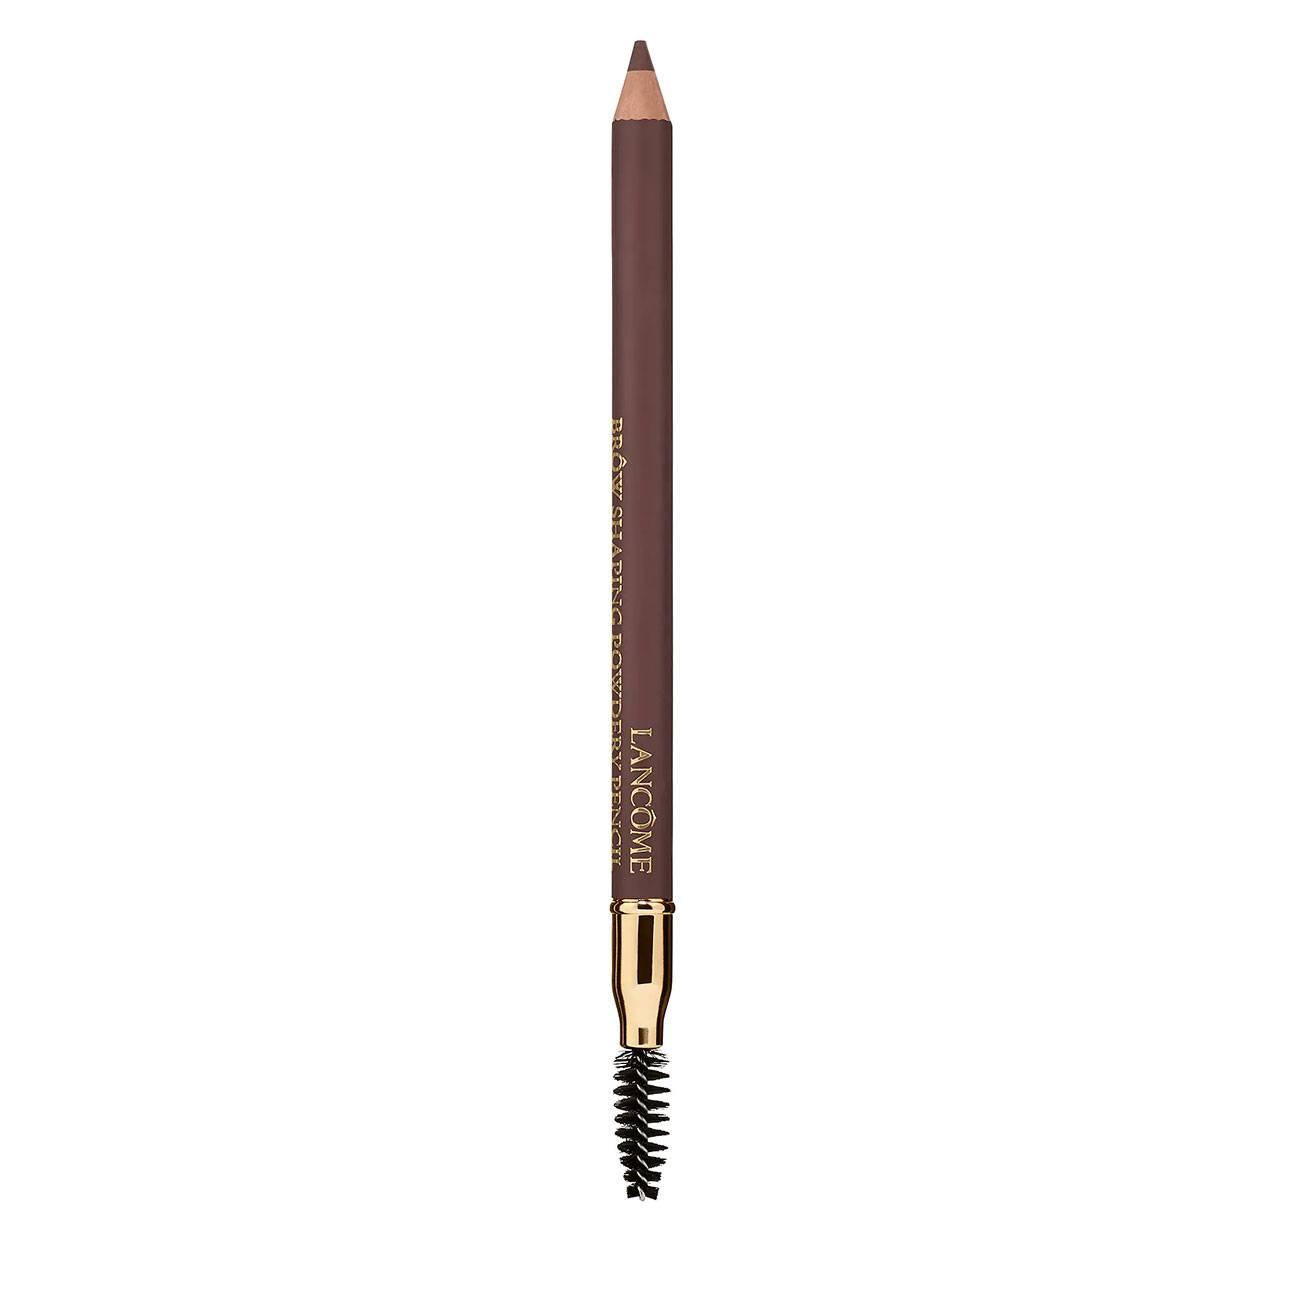 Brow Shaping Powdery Pencil 04 1.19gr Lancôme imagine 2021 bestvalue.eu